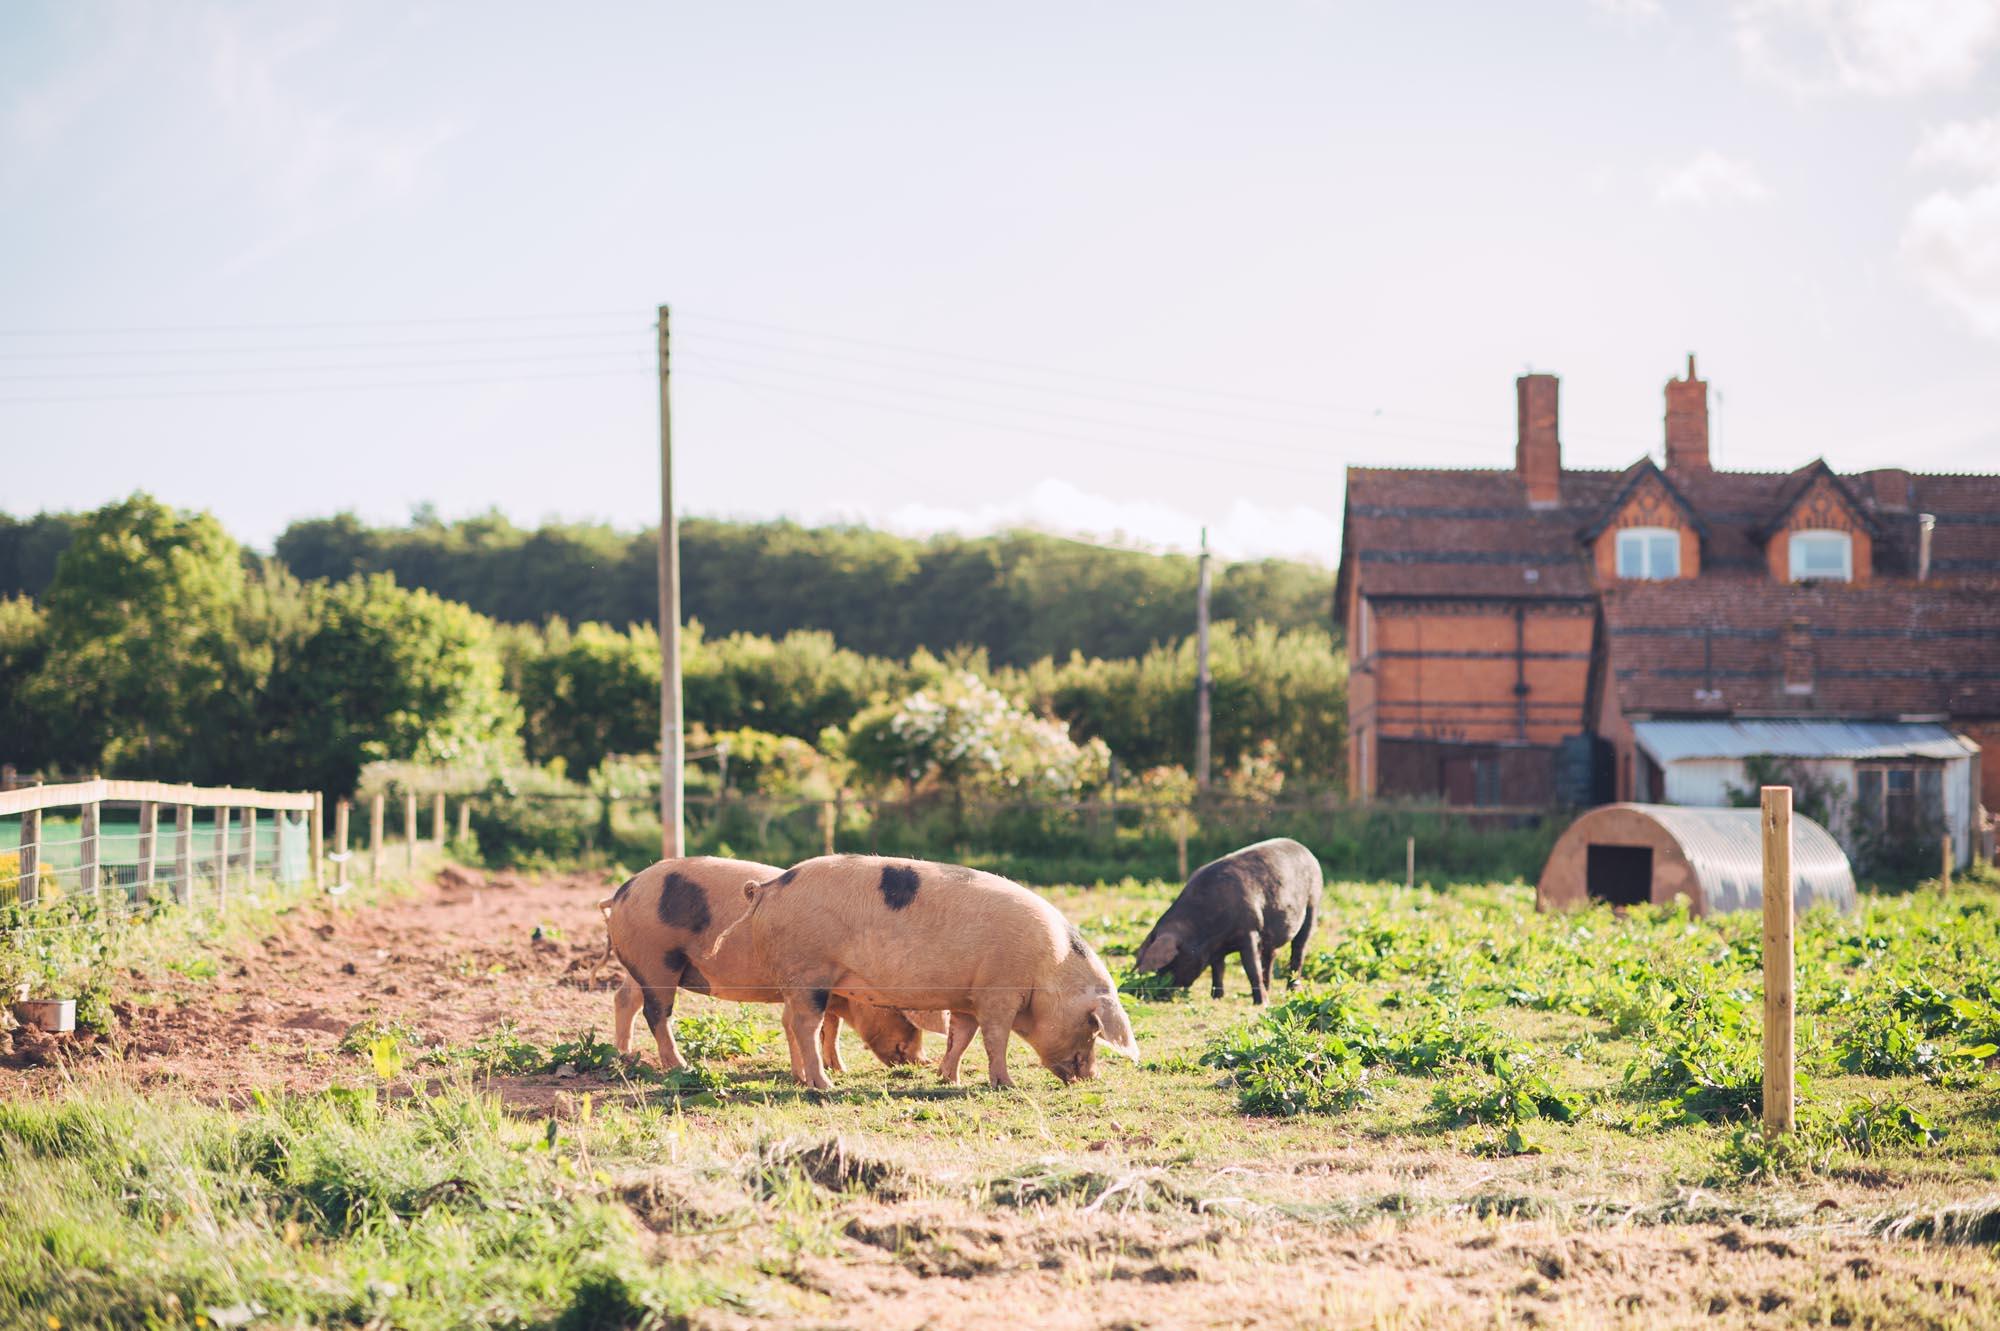 Nicola & Richard Wedding at Huntstile Farm - Pigs